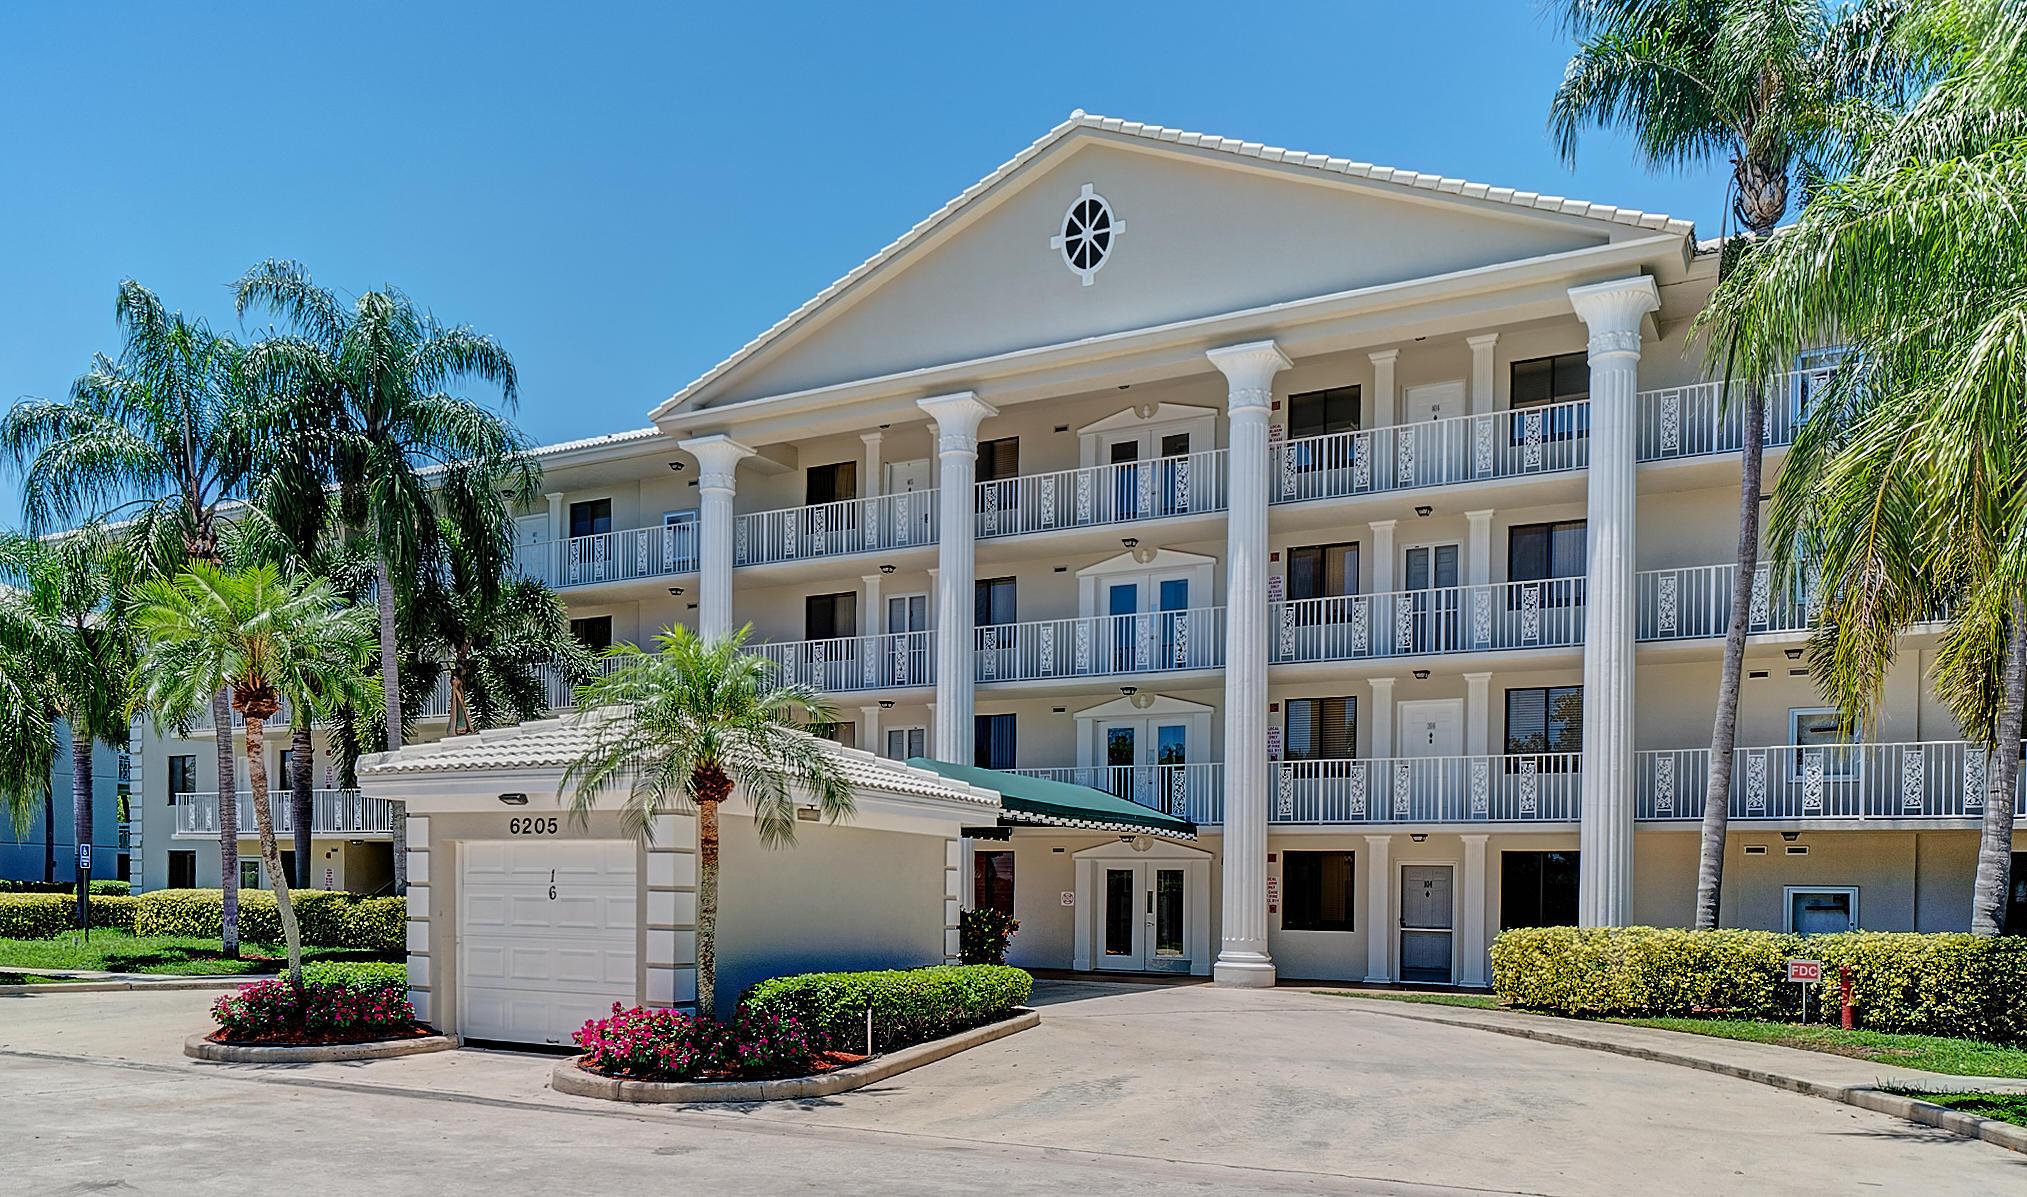 6205 Balboa Circle #302 Boca Raton, FL 33433